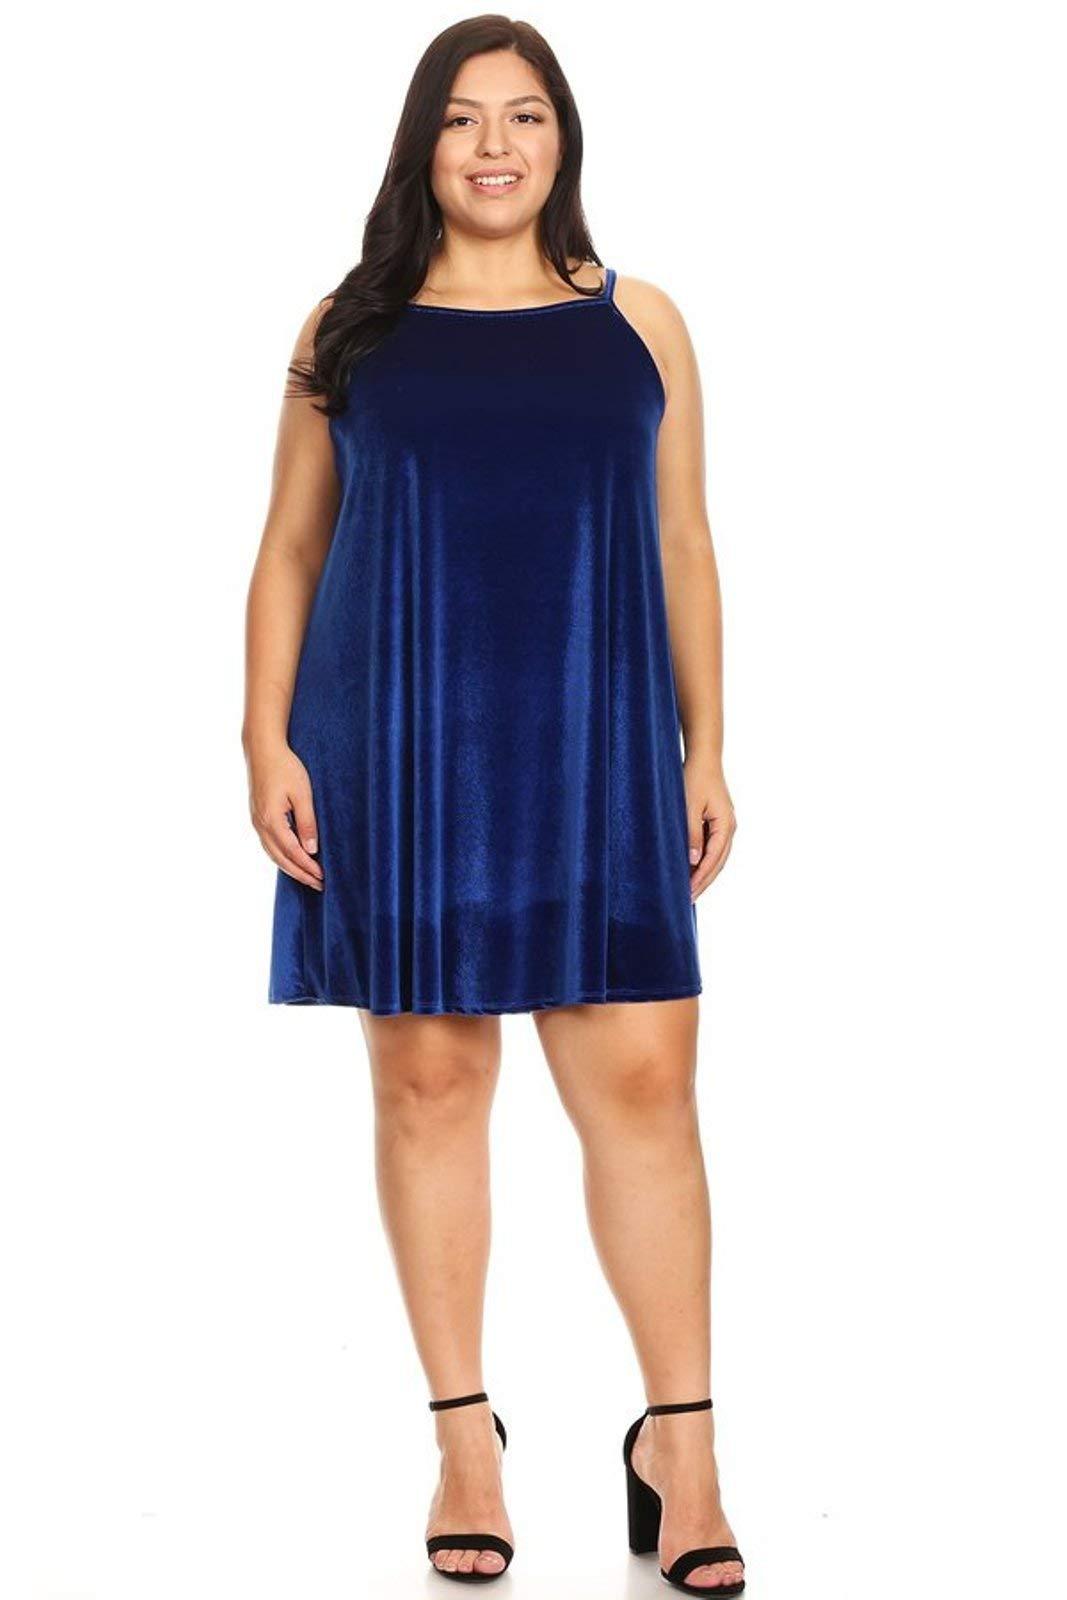 315345d0229 Vibe Sportswear Plus Size Velvet Sleeveless High Neck Trapeze Dress